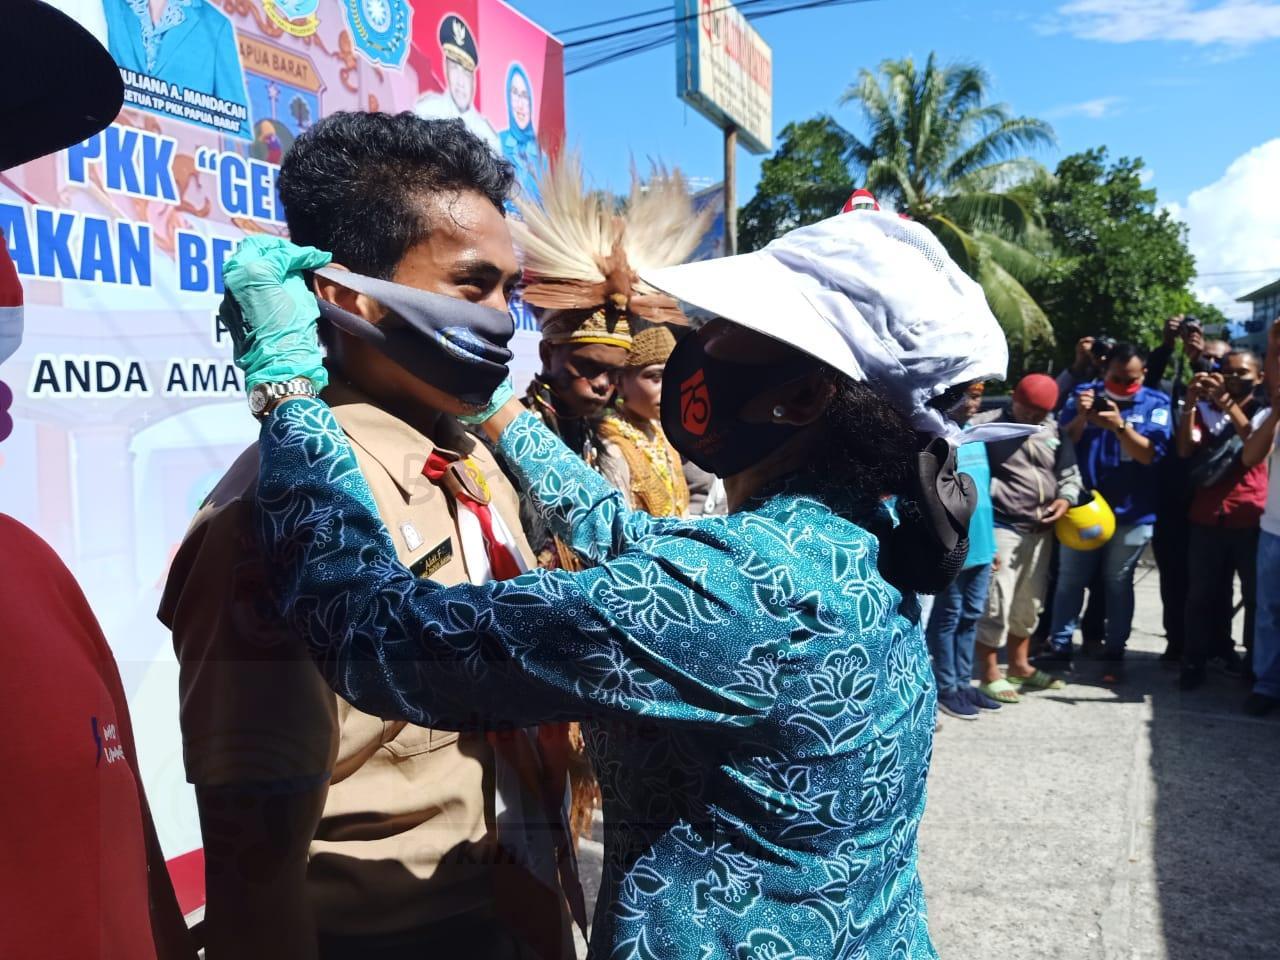 PKK Papua Barat Bagikan 10.000 Masker Kepada Pengendara di Manokwari 4 IMG 20200817 WA0163